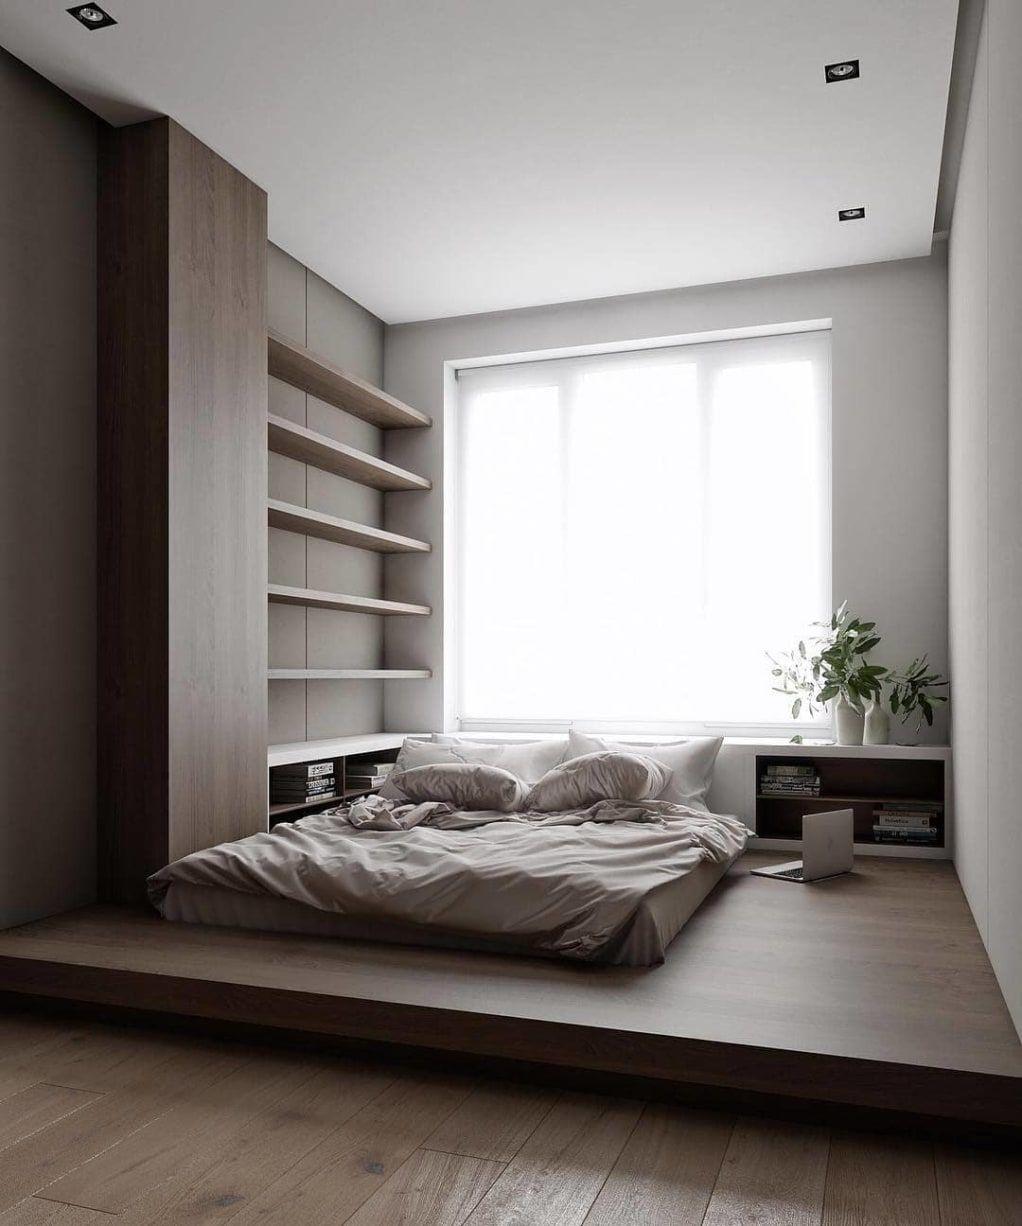 Minimal Interior Design Inspiration 175 Bedroom Interior Home Decor Bedroom Home Bedroom Interior home design bedroom